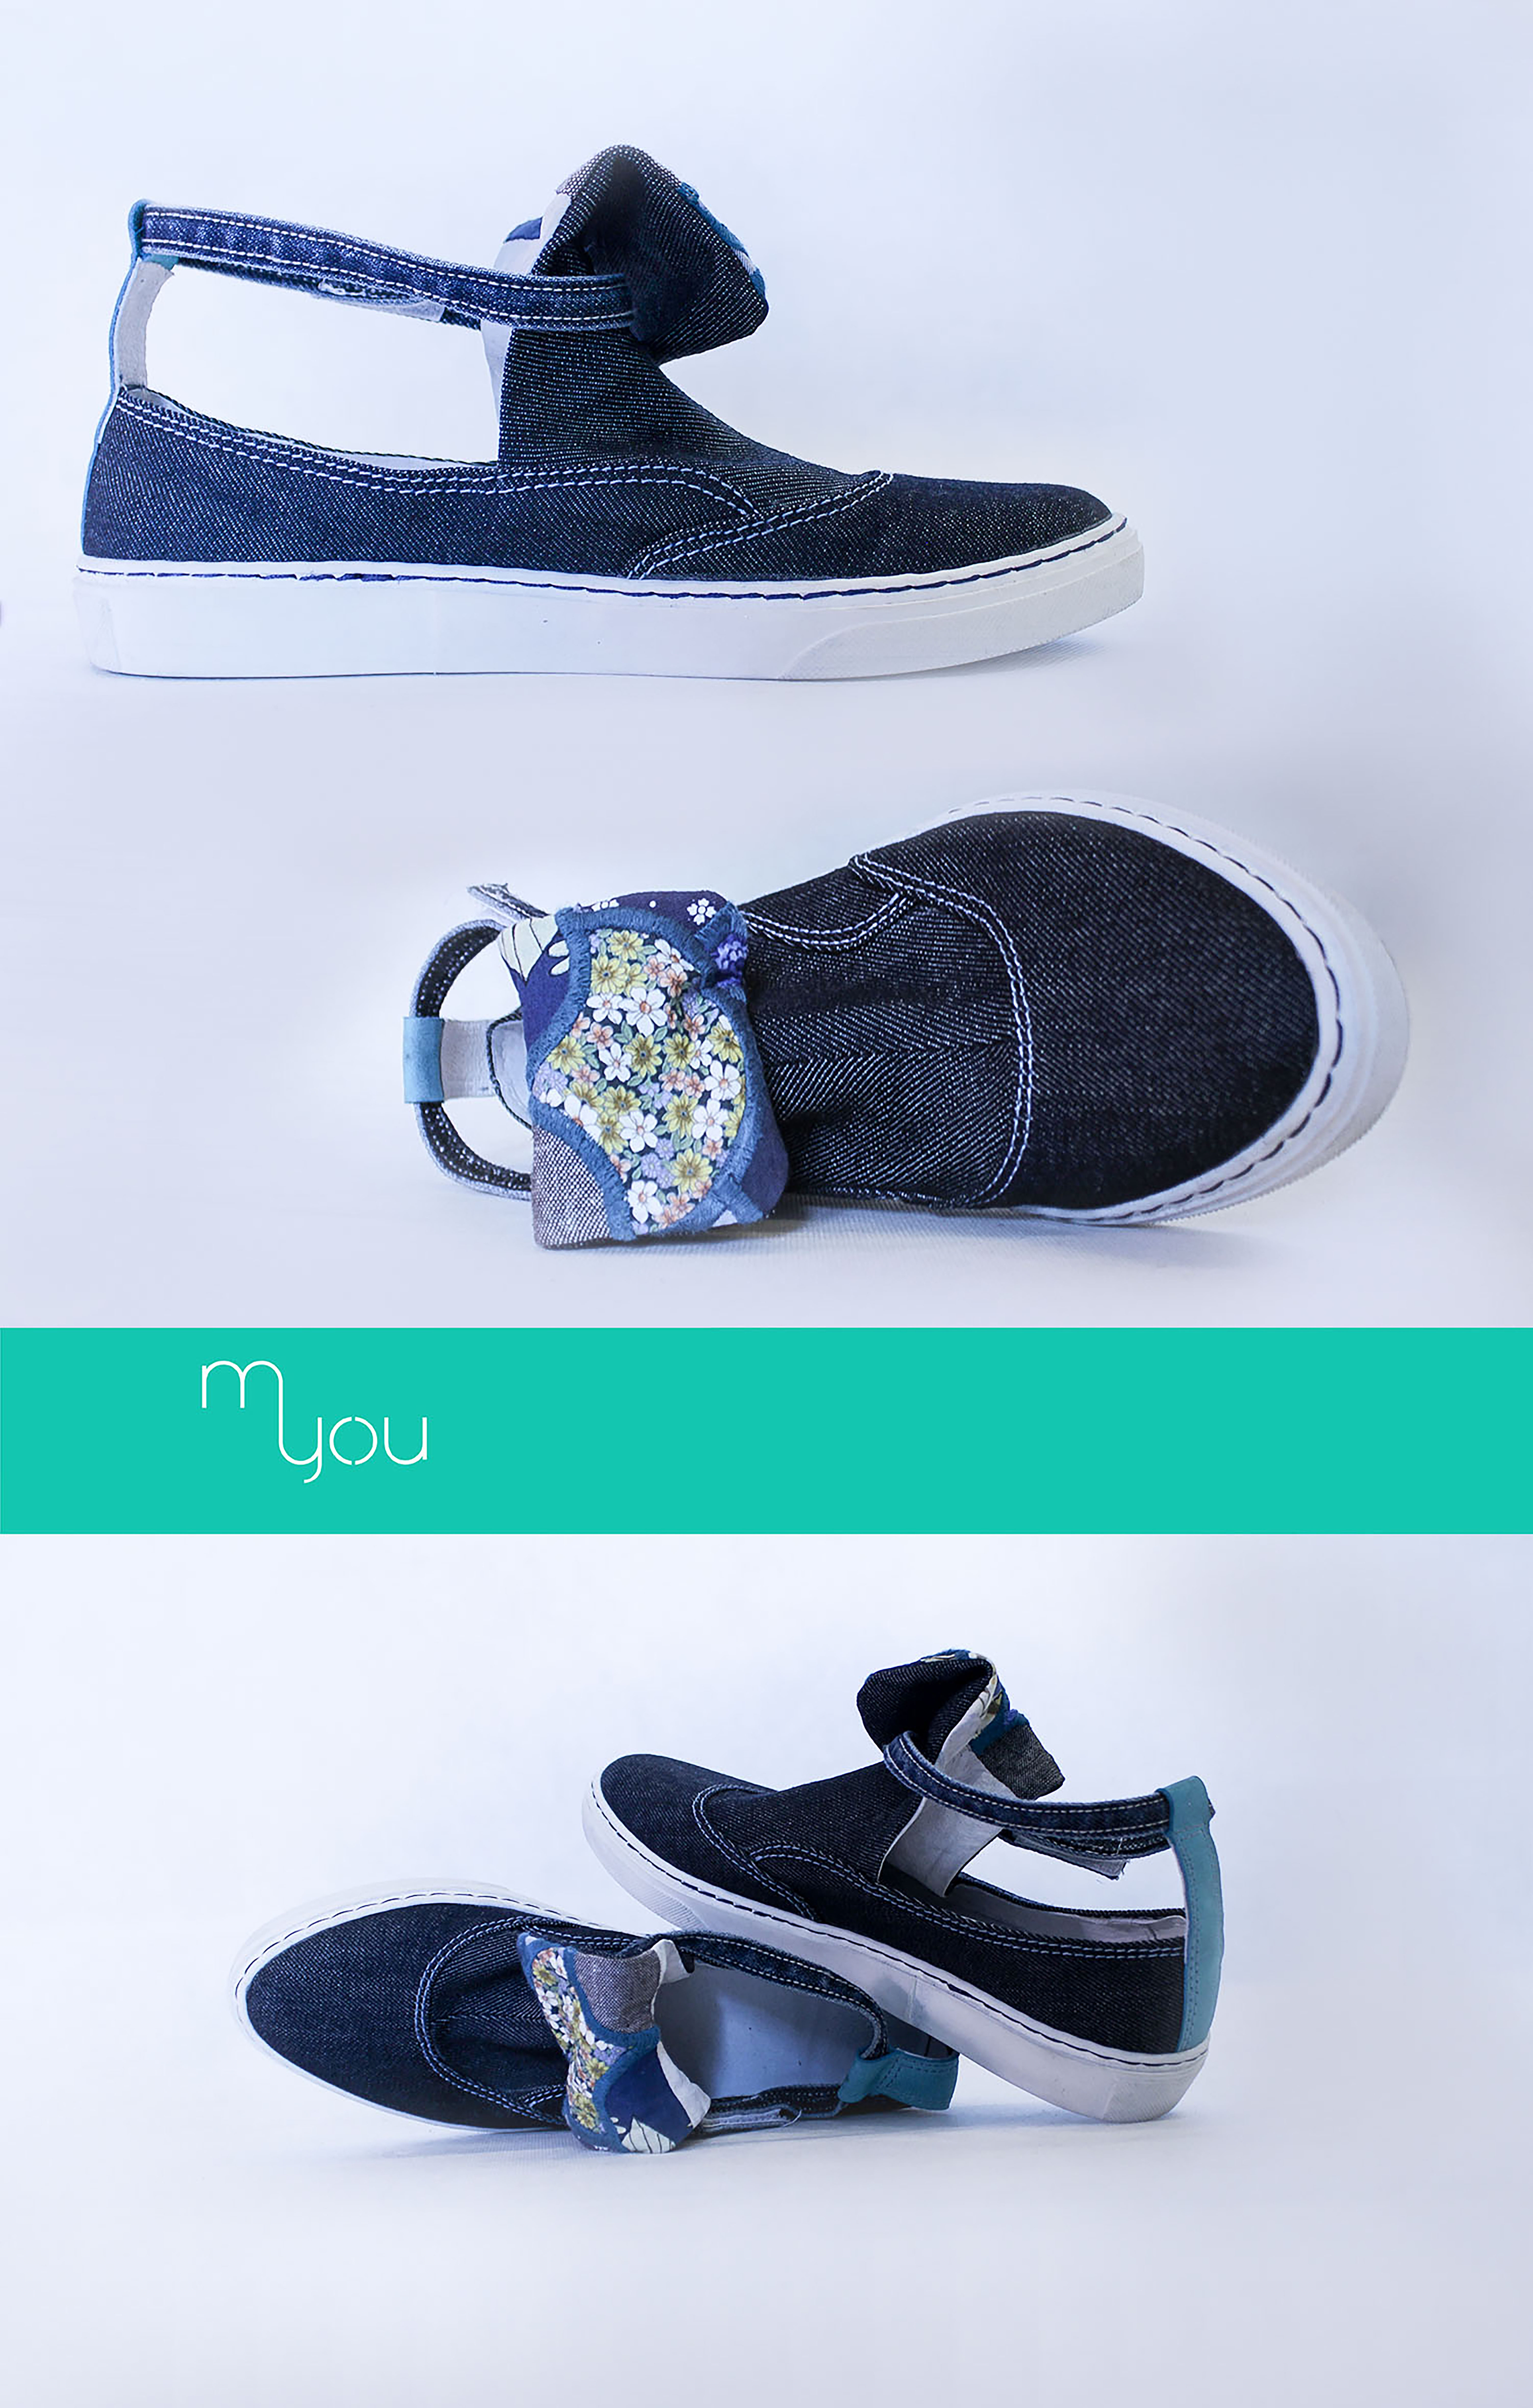 Pracownia obuwia i galanerii (4)